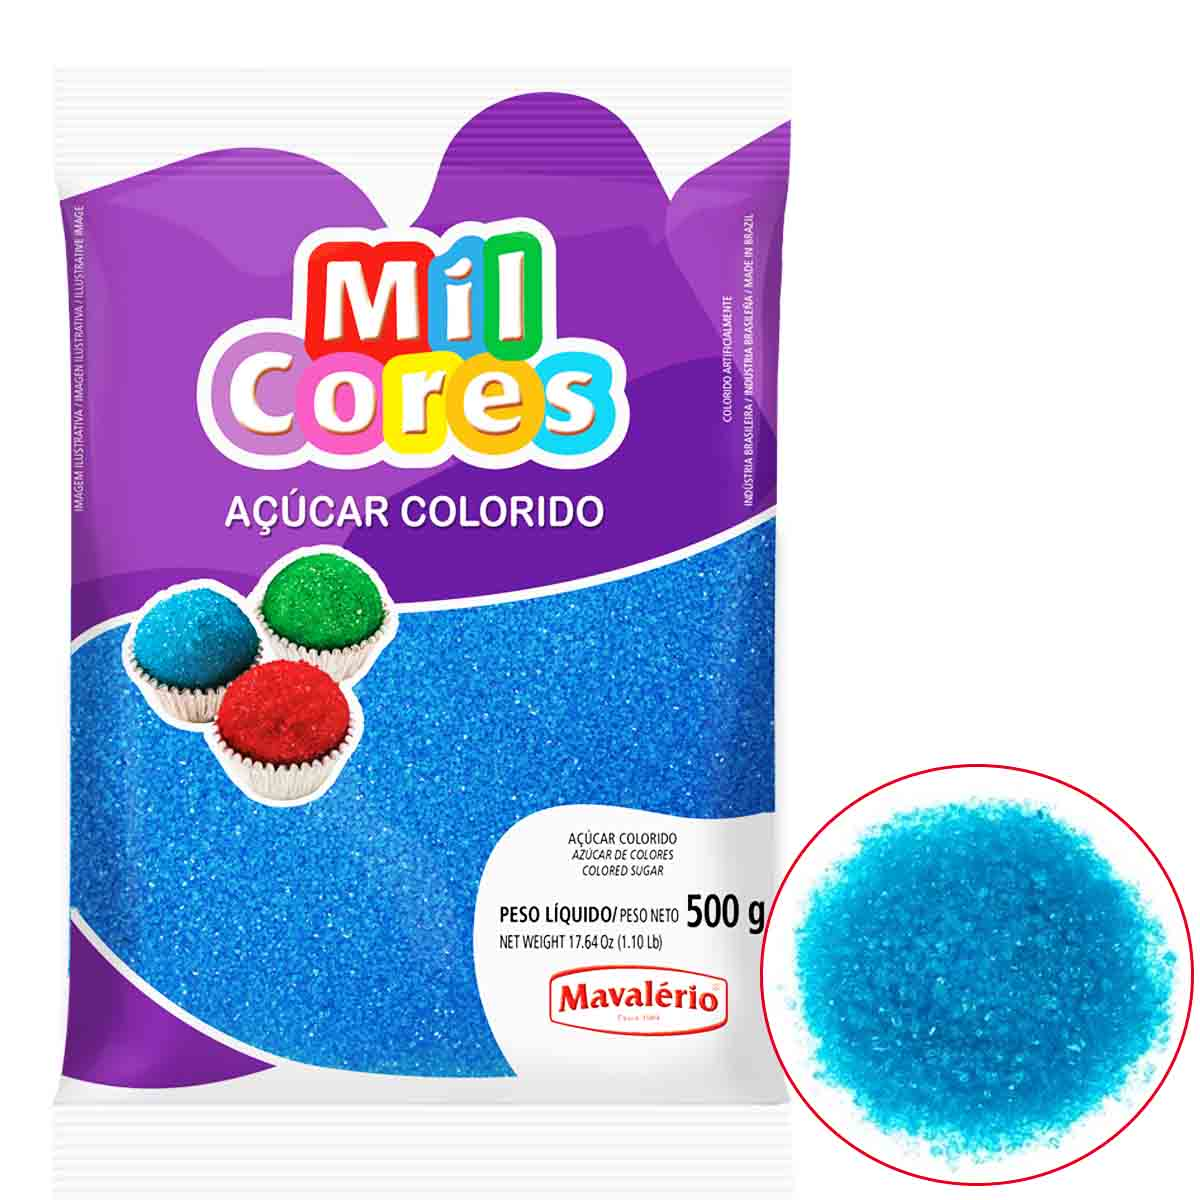 Açúcar Colorido Azul Mil Cores Mavalério 500g